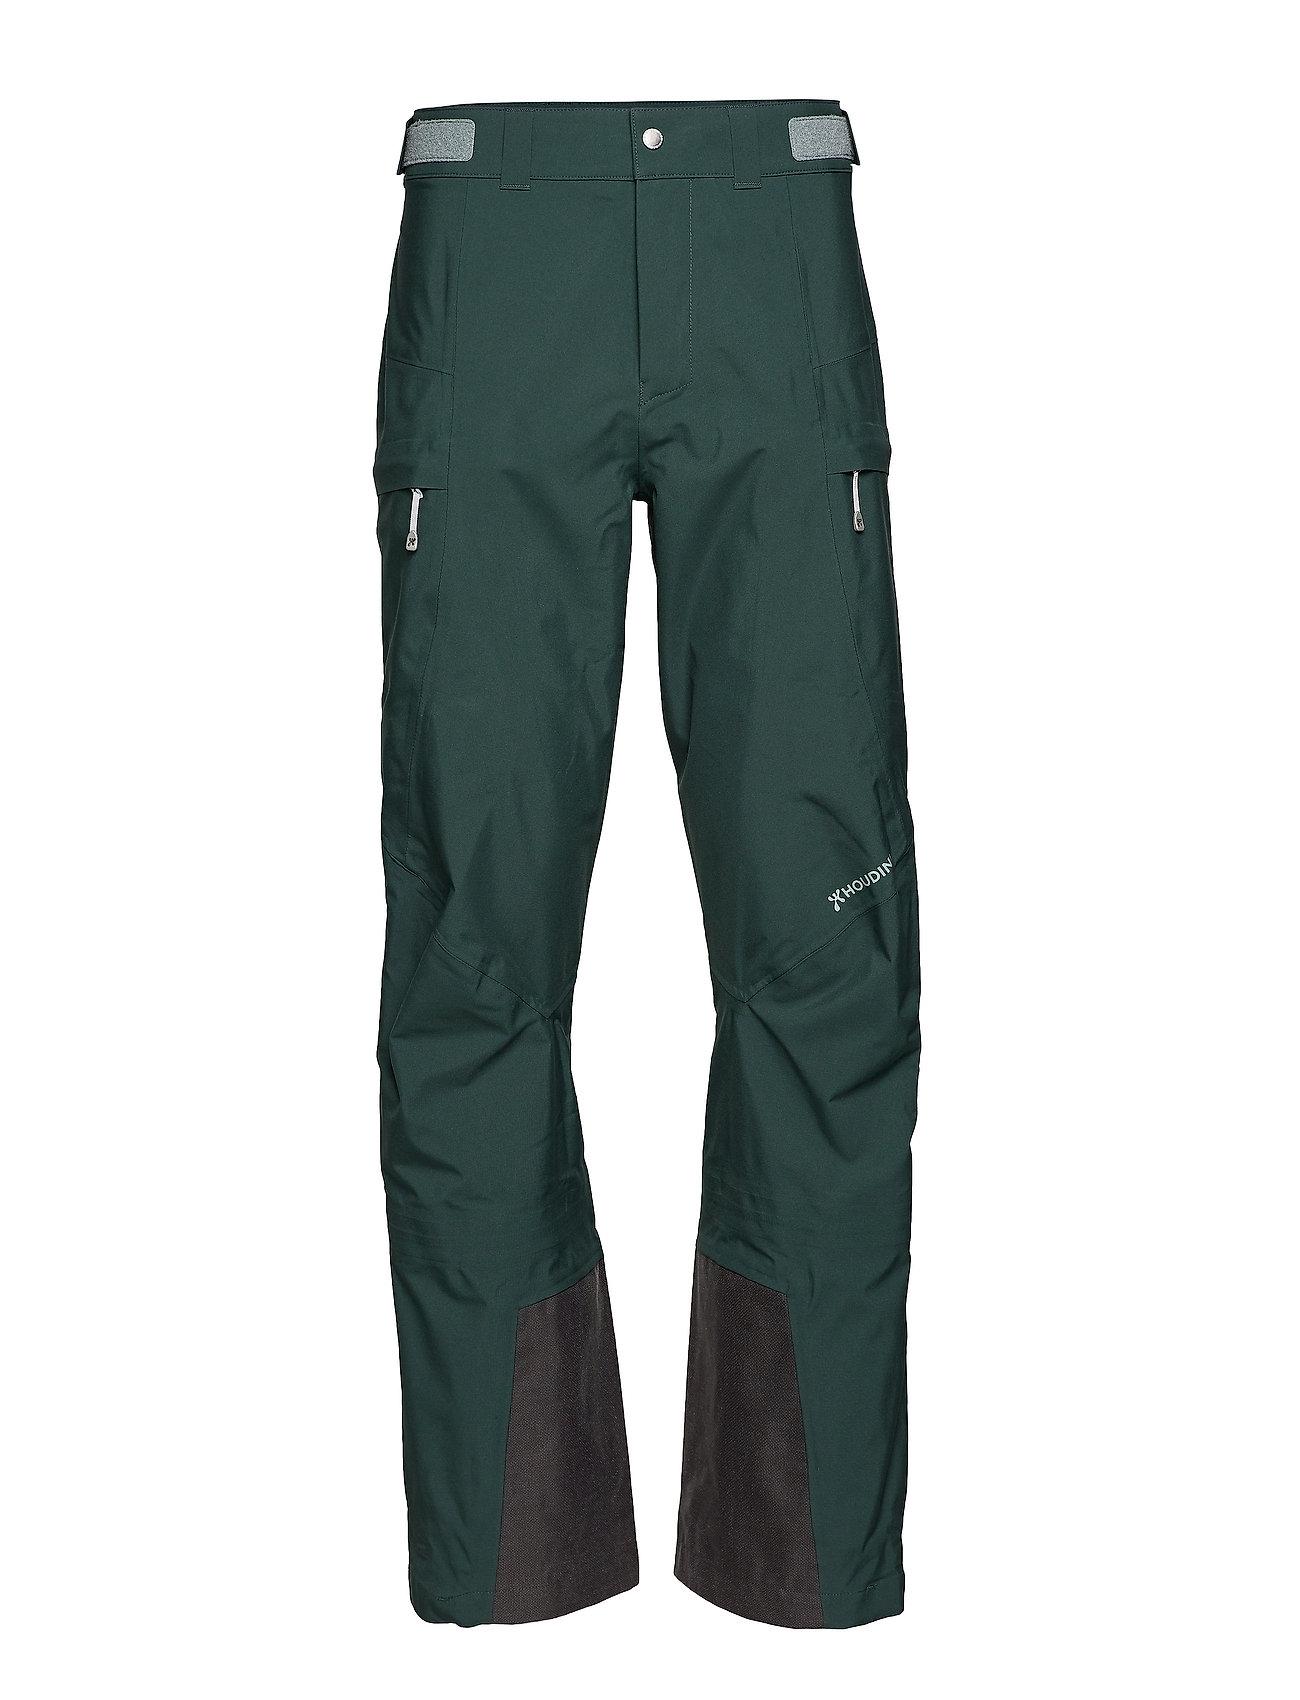 Image of M'S Angular Pant Sport Pants Grøn Houdini (3260673807)